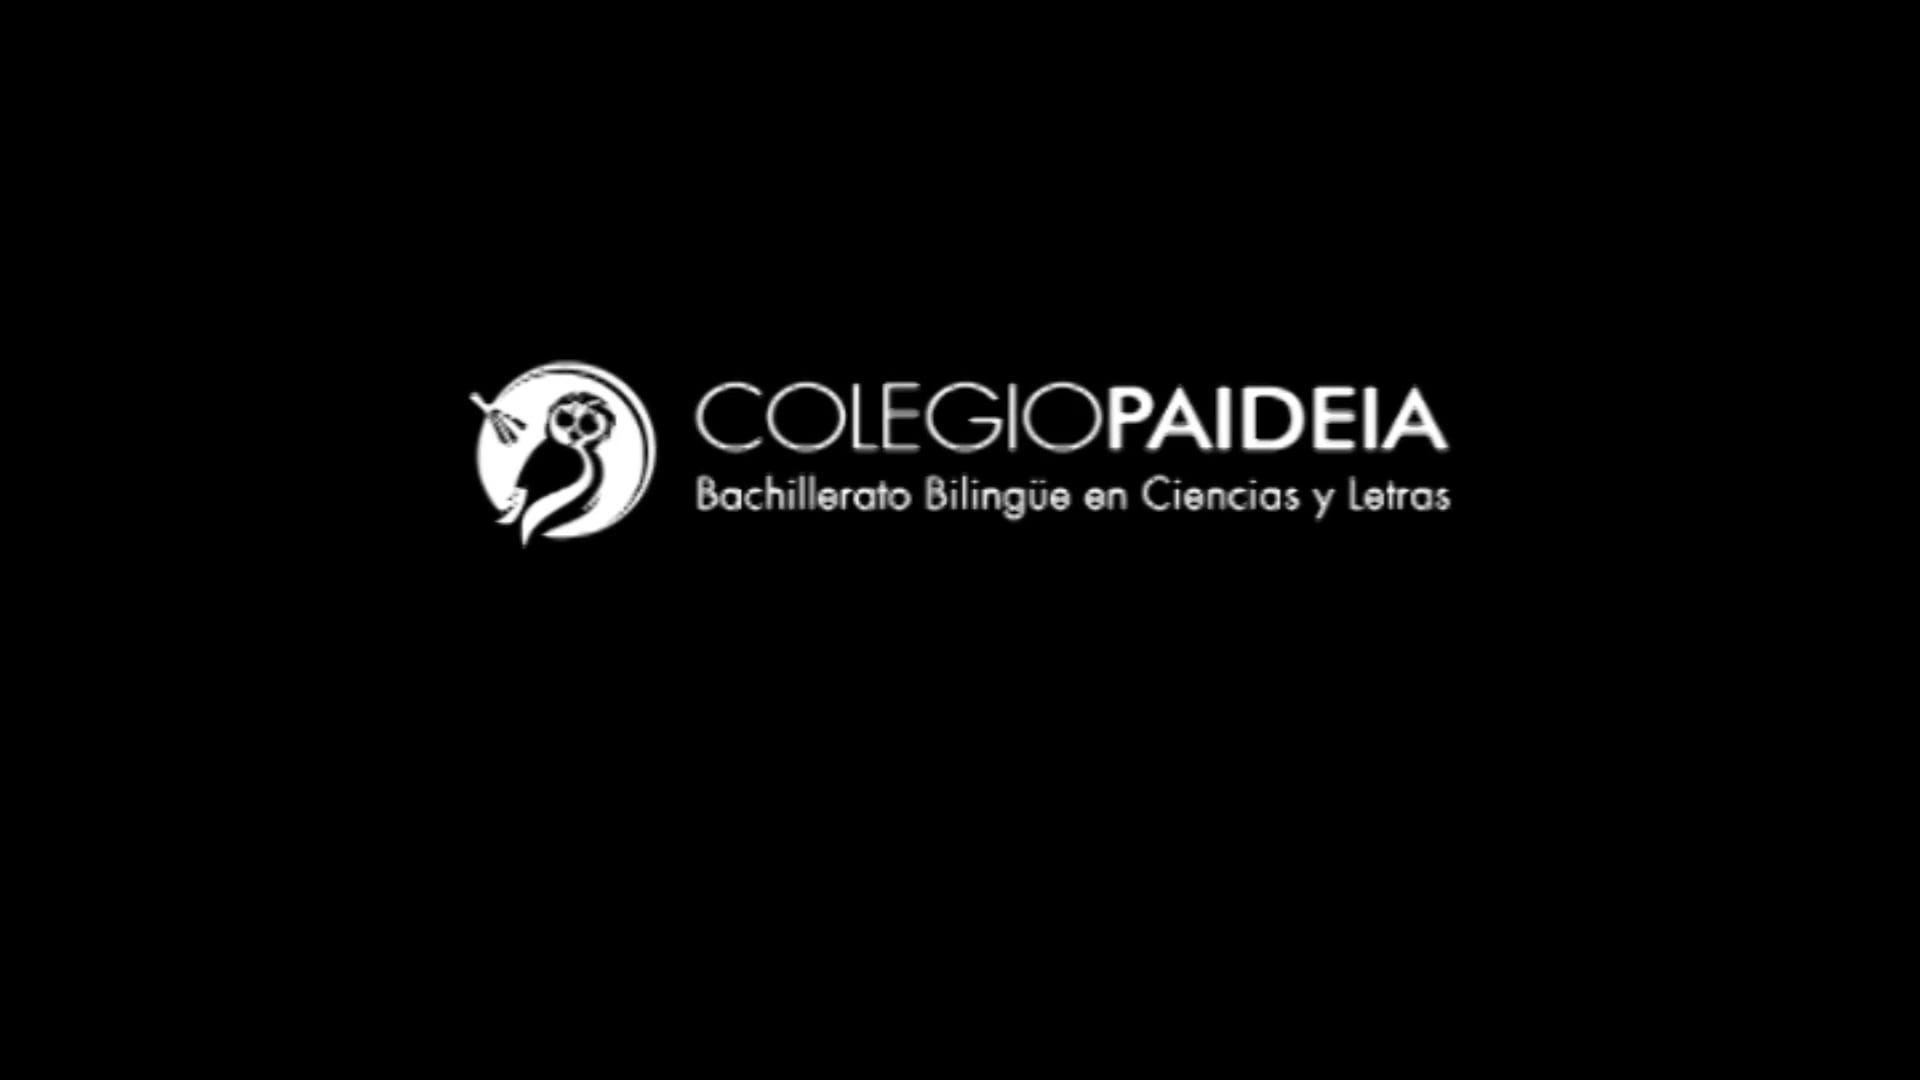 Colegio Paideia - Recuerdos Egresados 2015